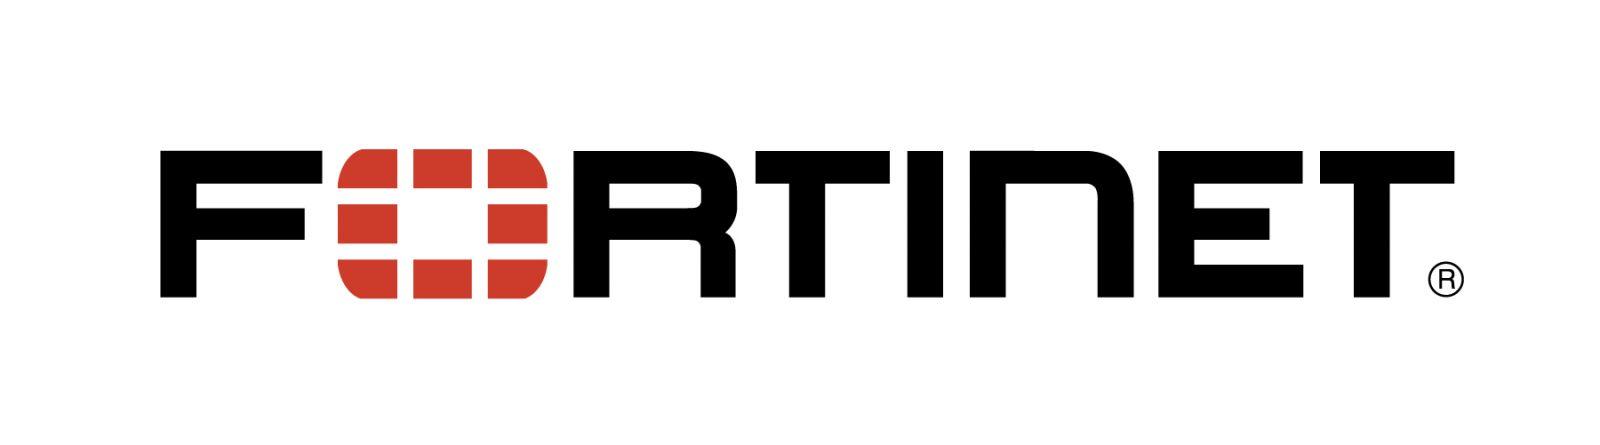 brand's name